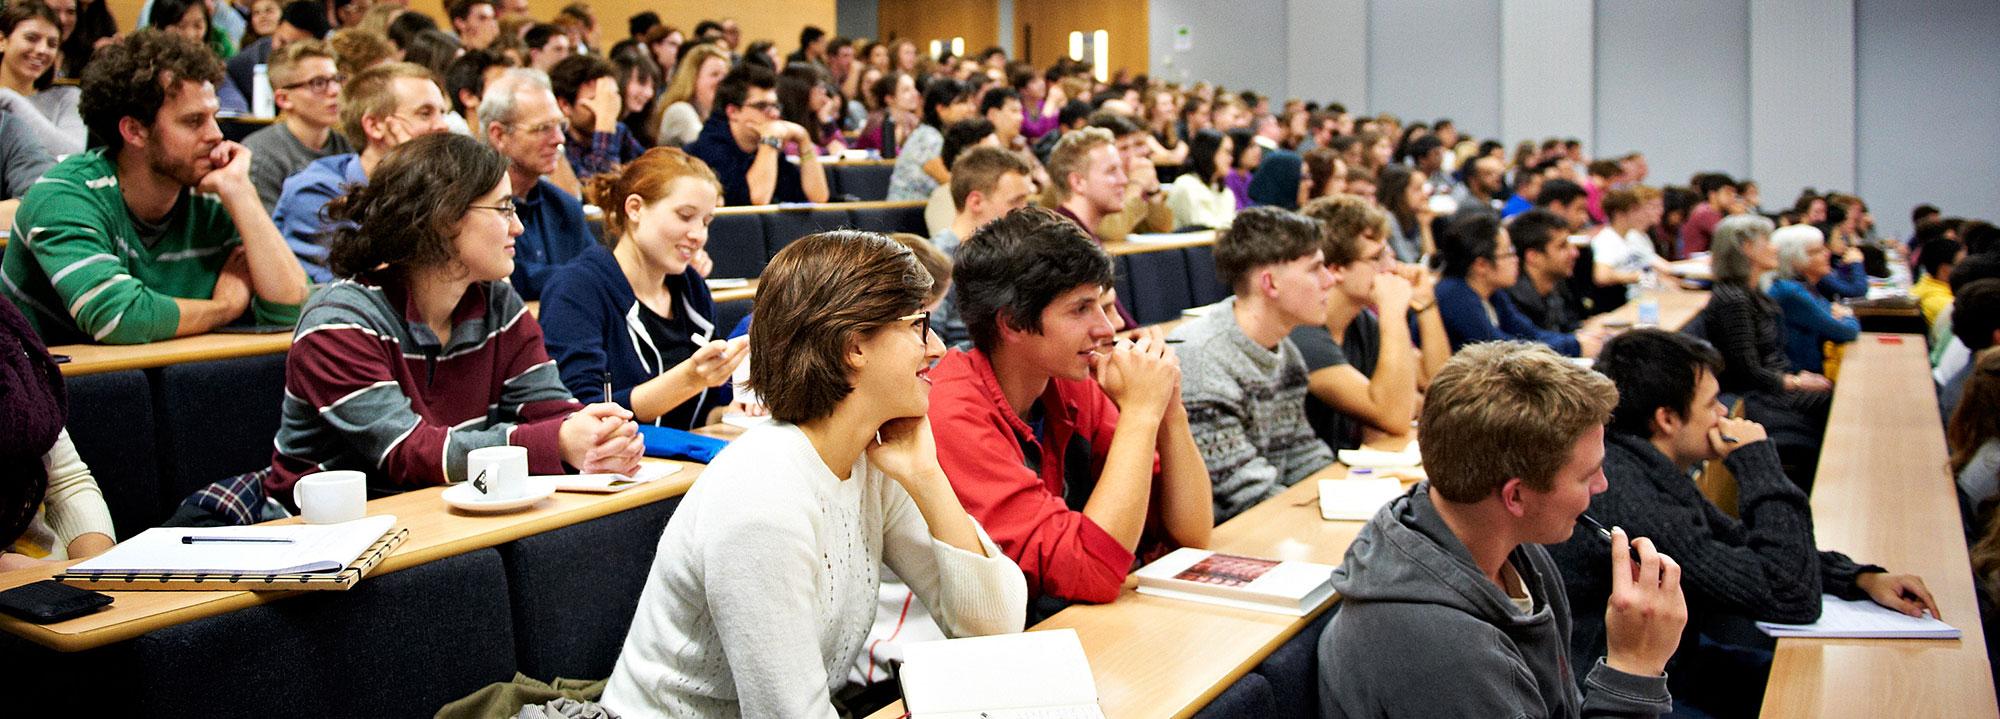 university-ingiltere-University-Of-Birmingham-6.jpg